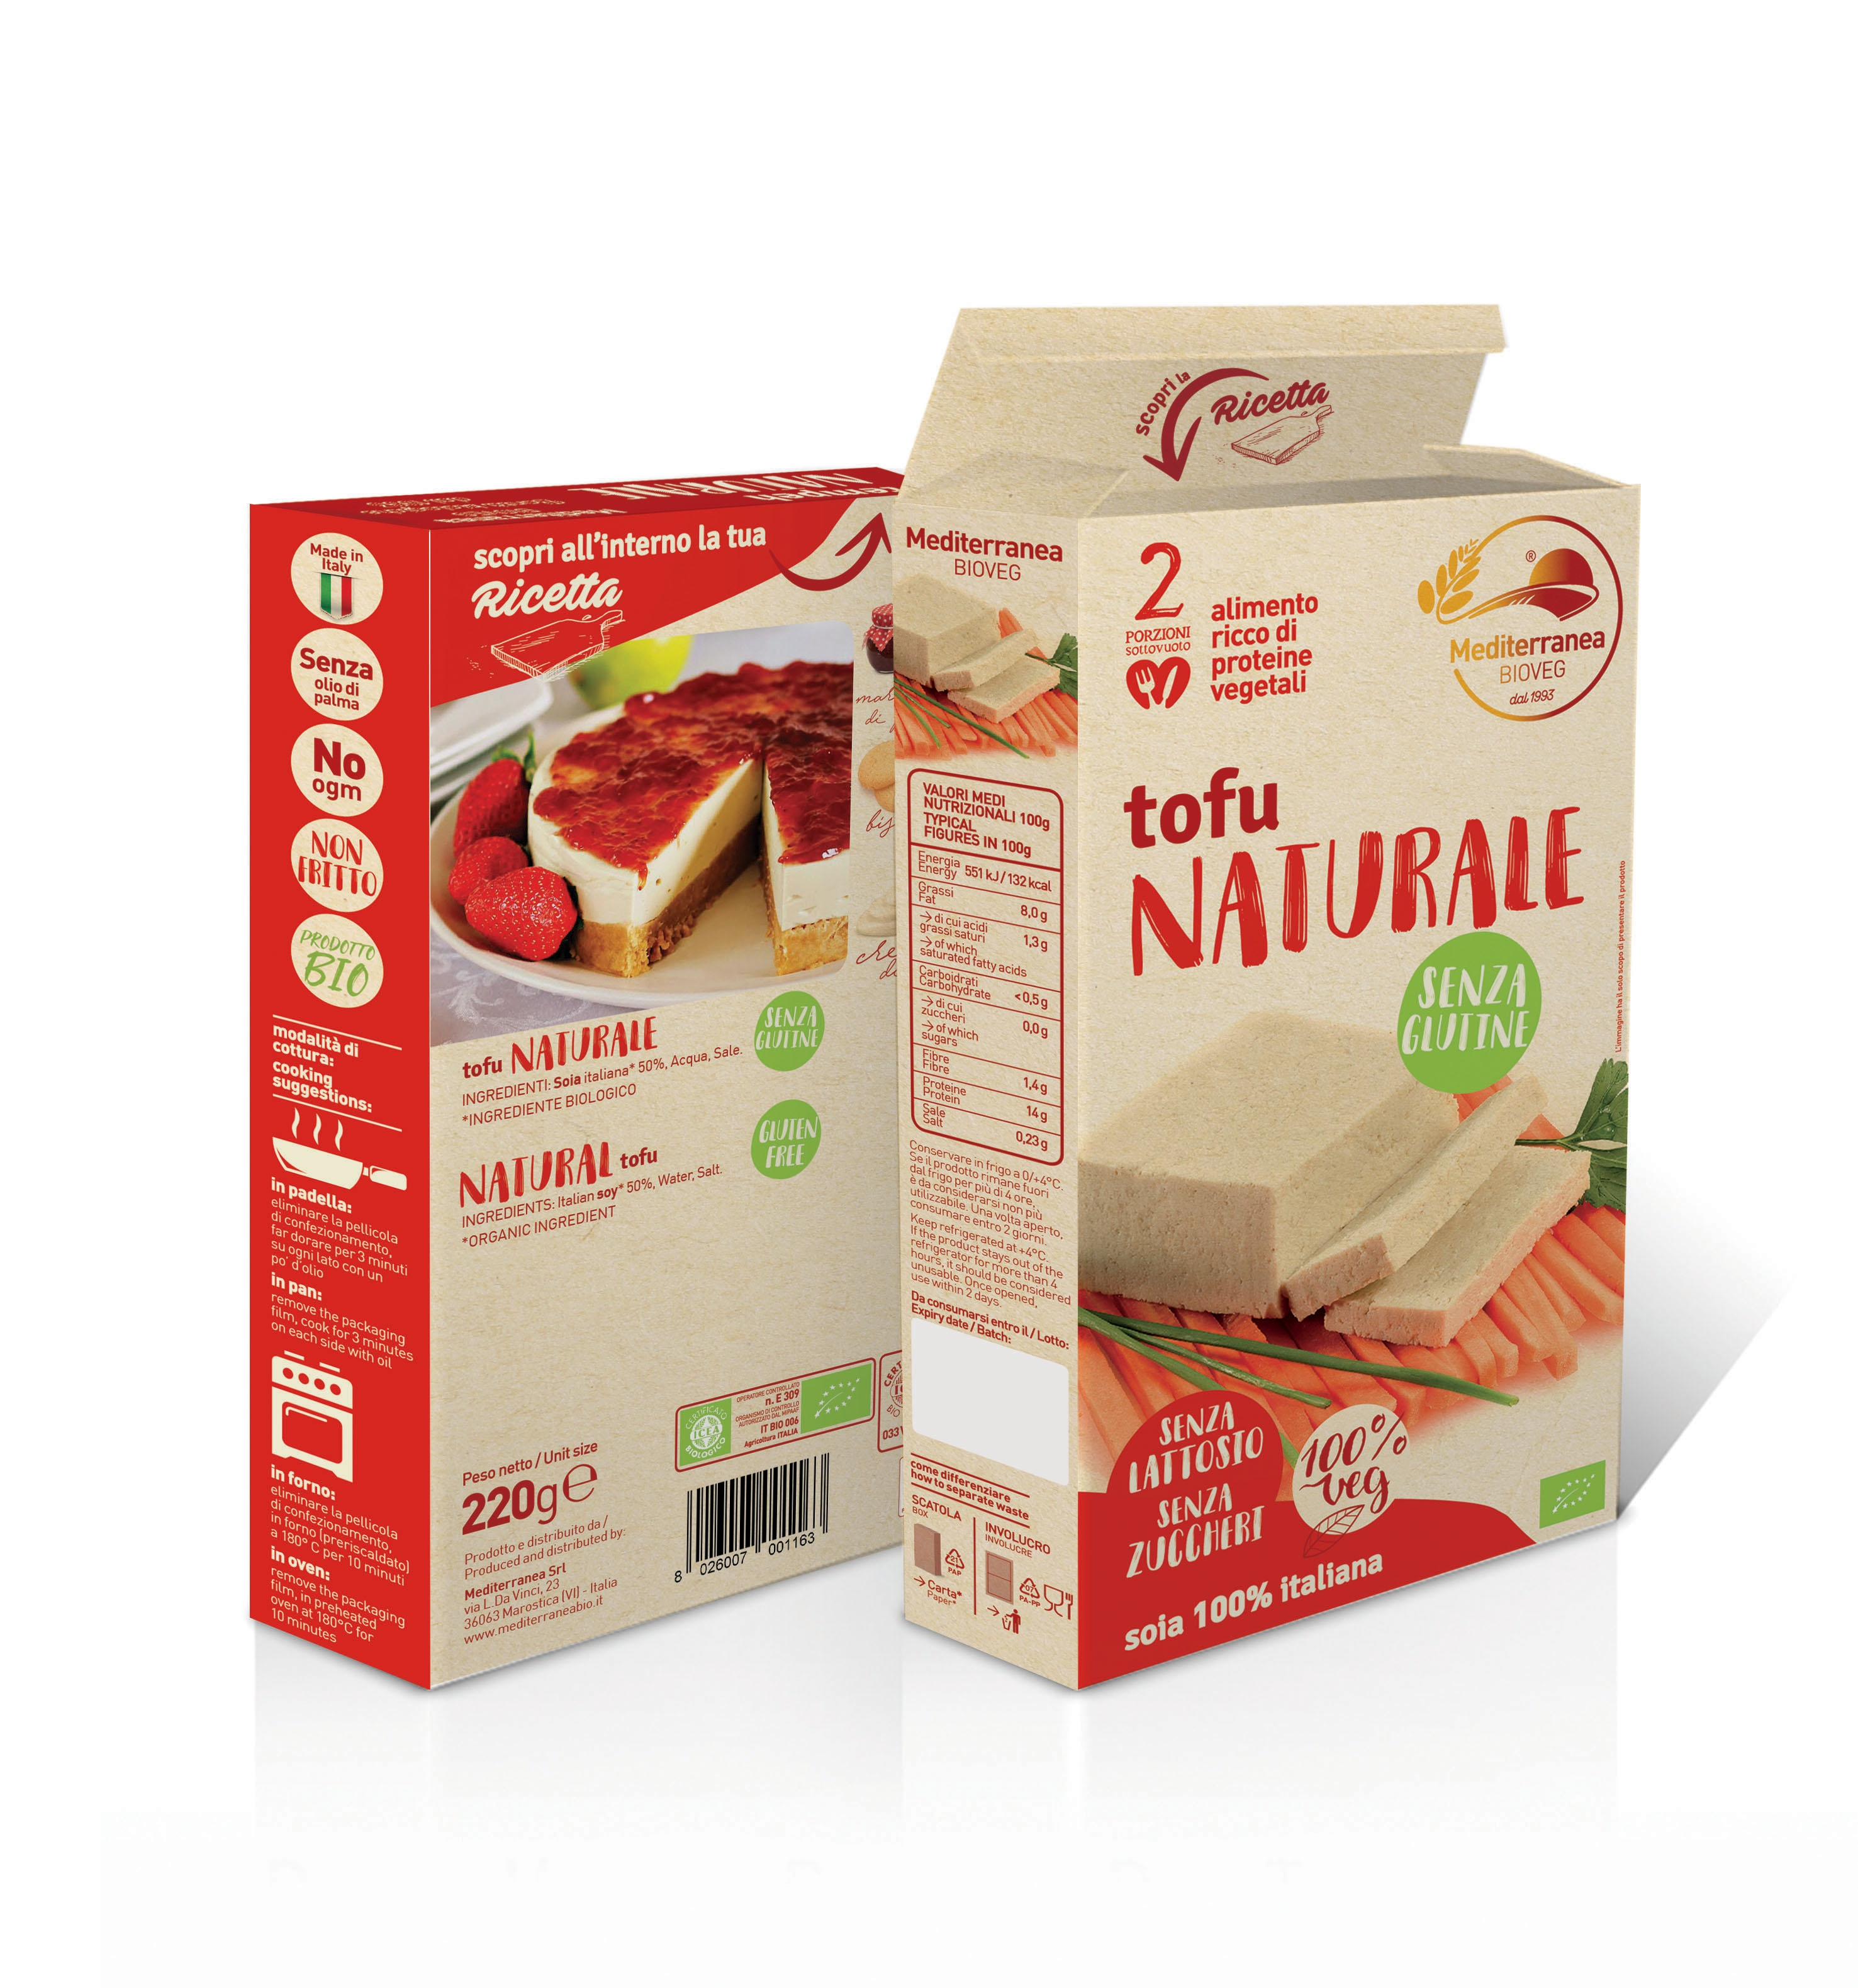 Tofu naturale senza glutine